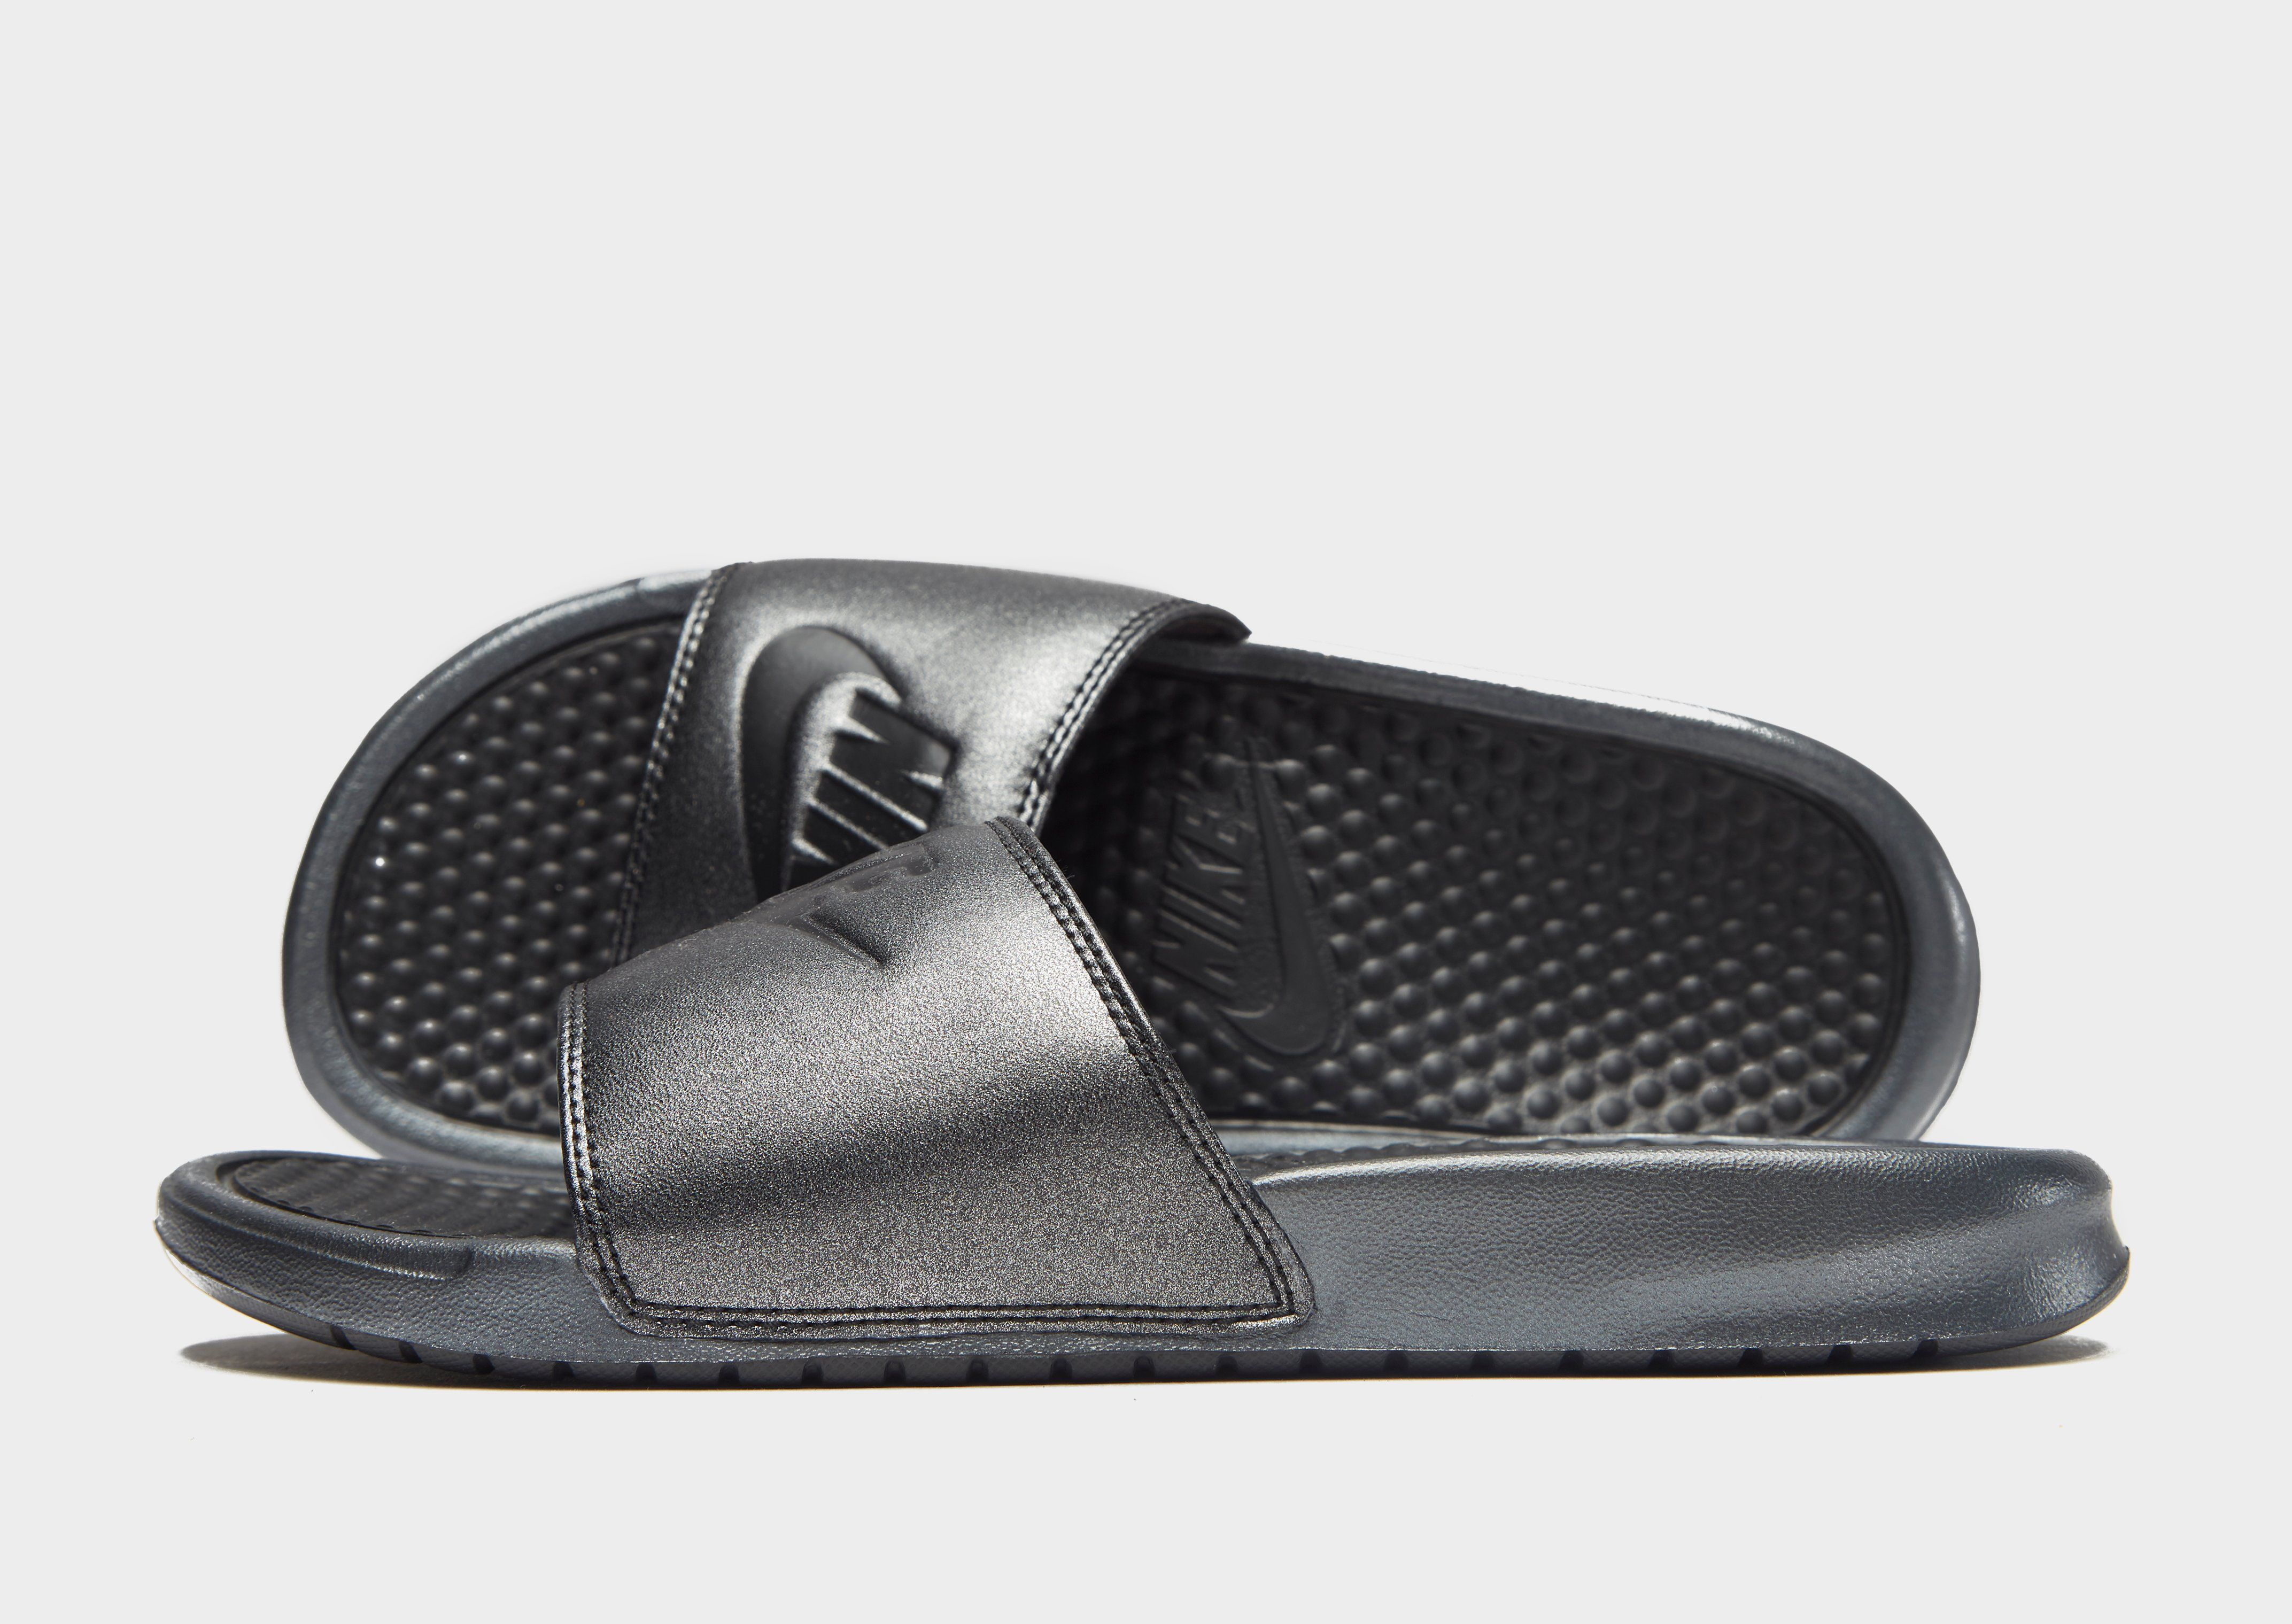 aa38f6c70212 Nike Benassi Slides Women s